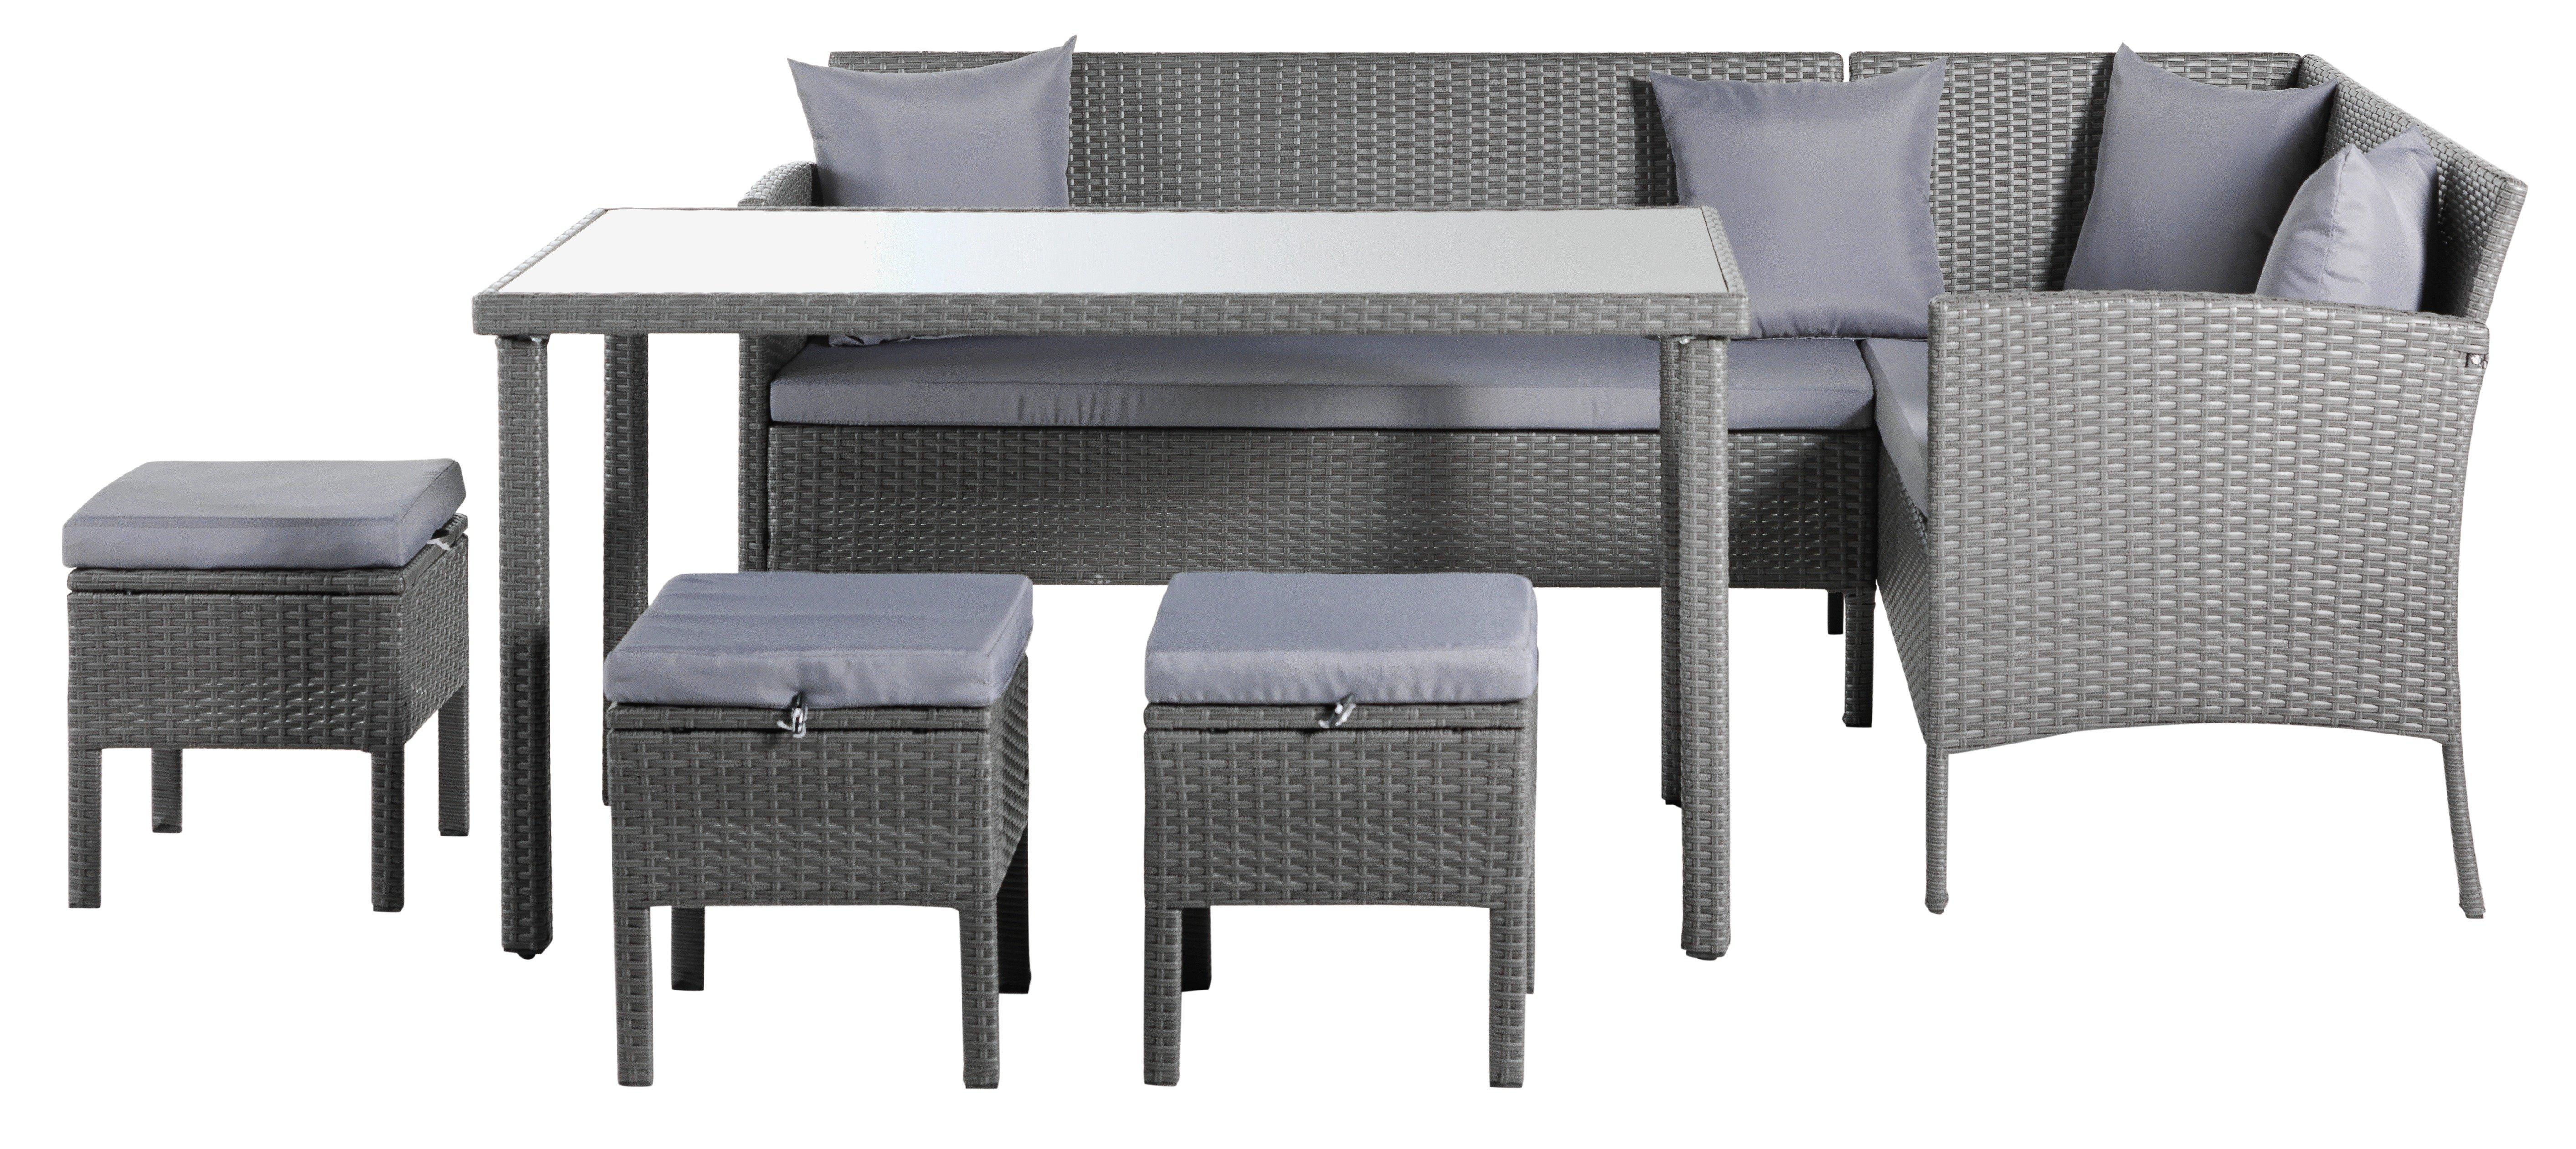 Argos Home 8 Seater Rattan Effect Corner Sofa Set - Grey